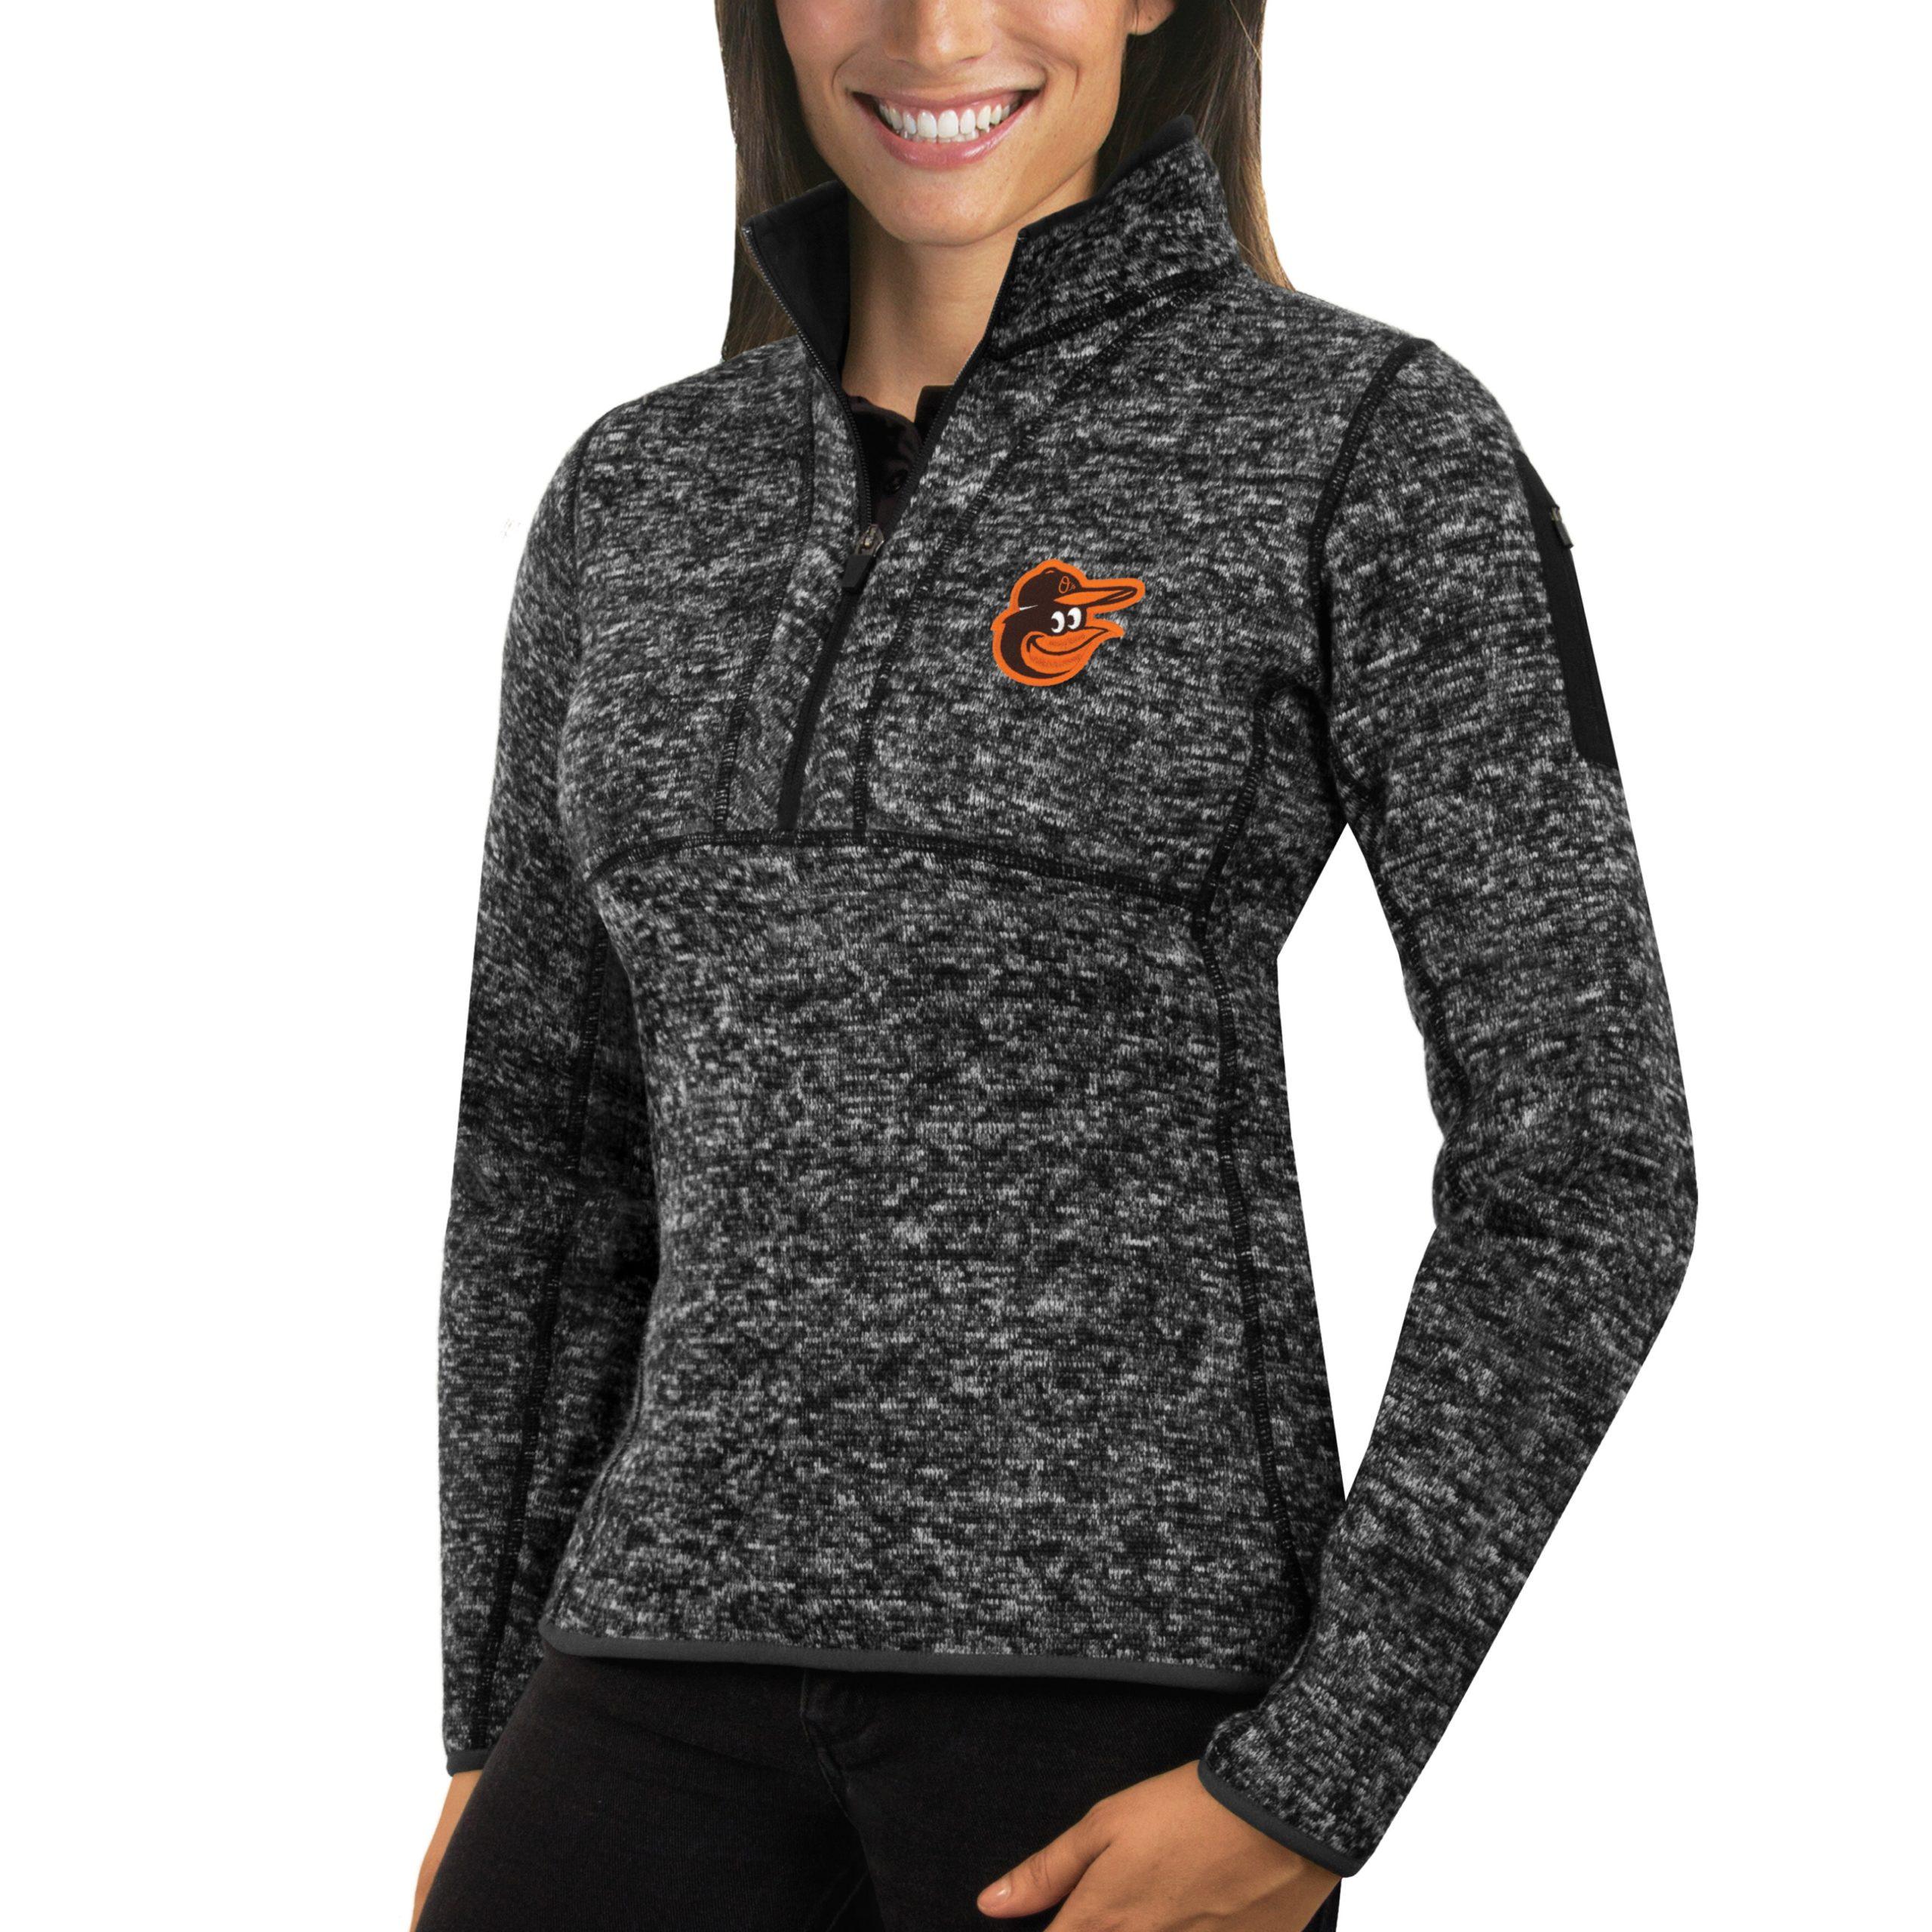 Baltimore Orioles Antigua Women's Fortune Half-Zip Pullover Sweater - Heathered Black